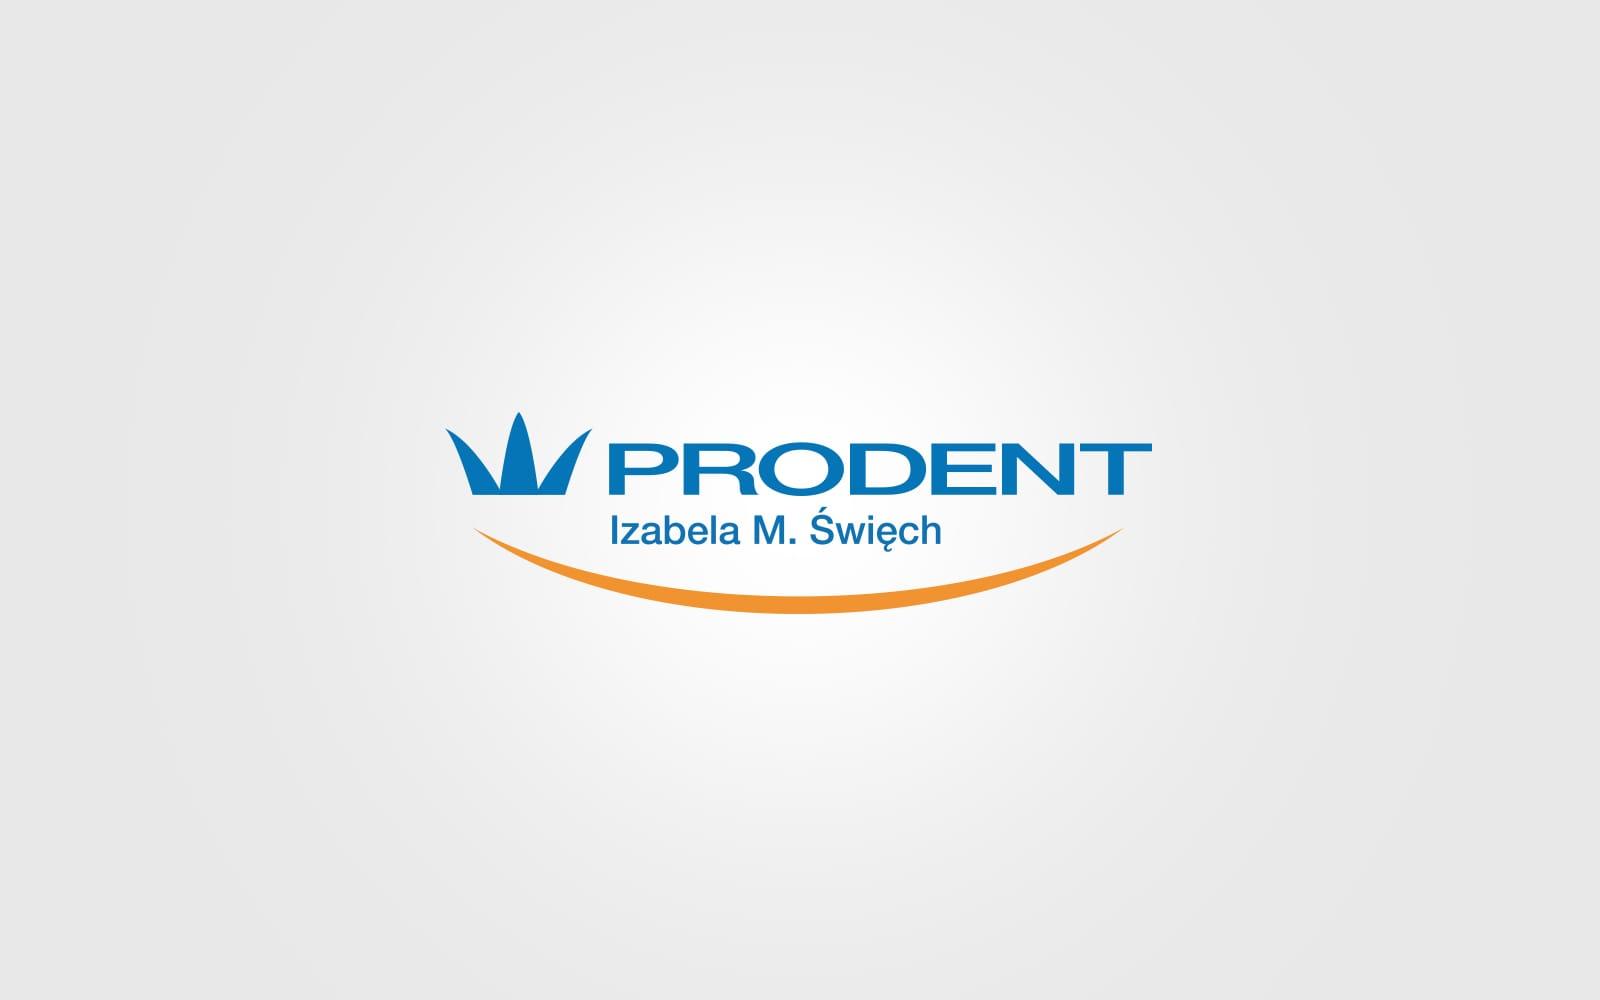 prodent-logo